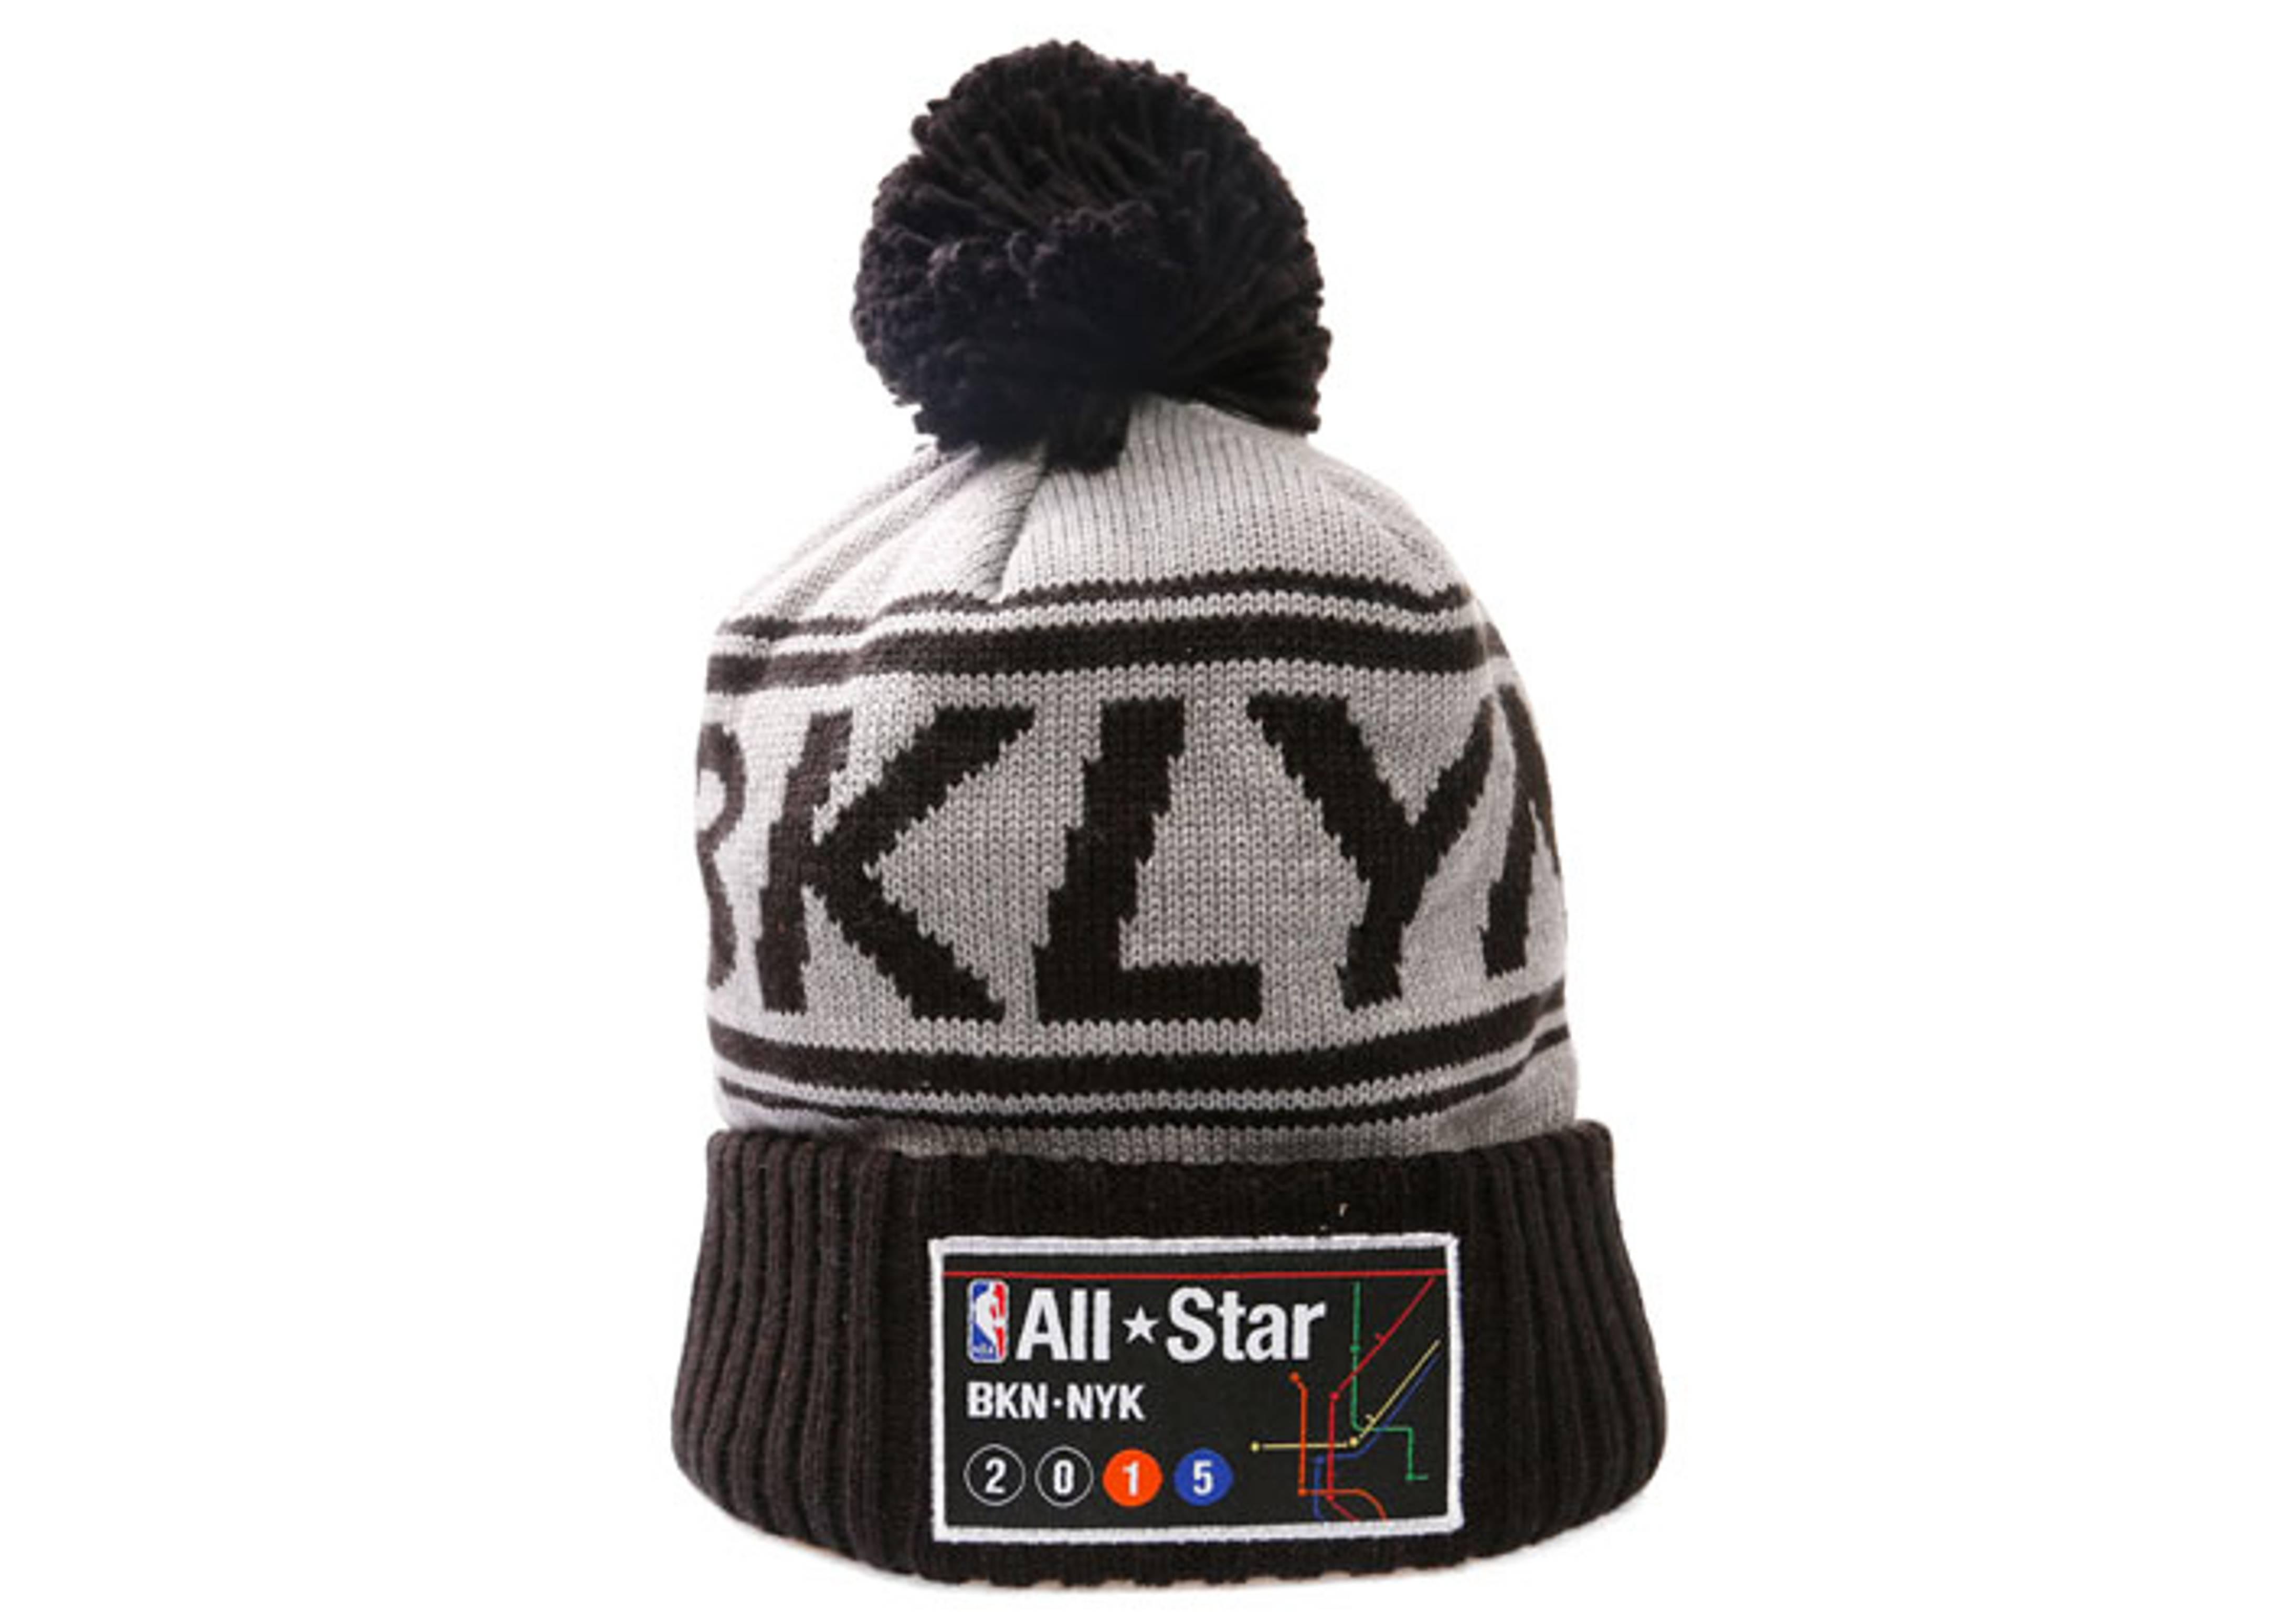 nyc all-star game 2015 cuffed pom knit beanie